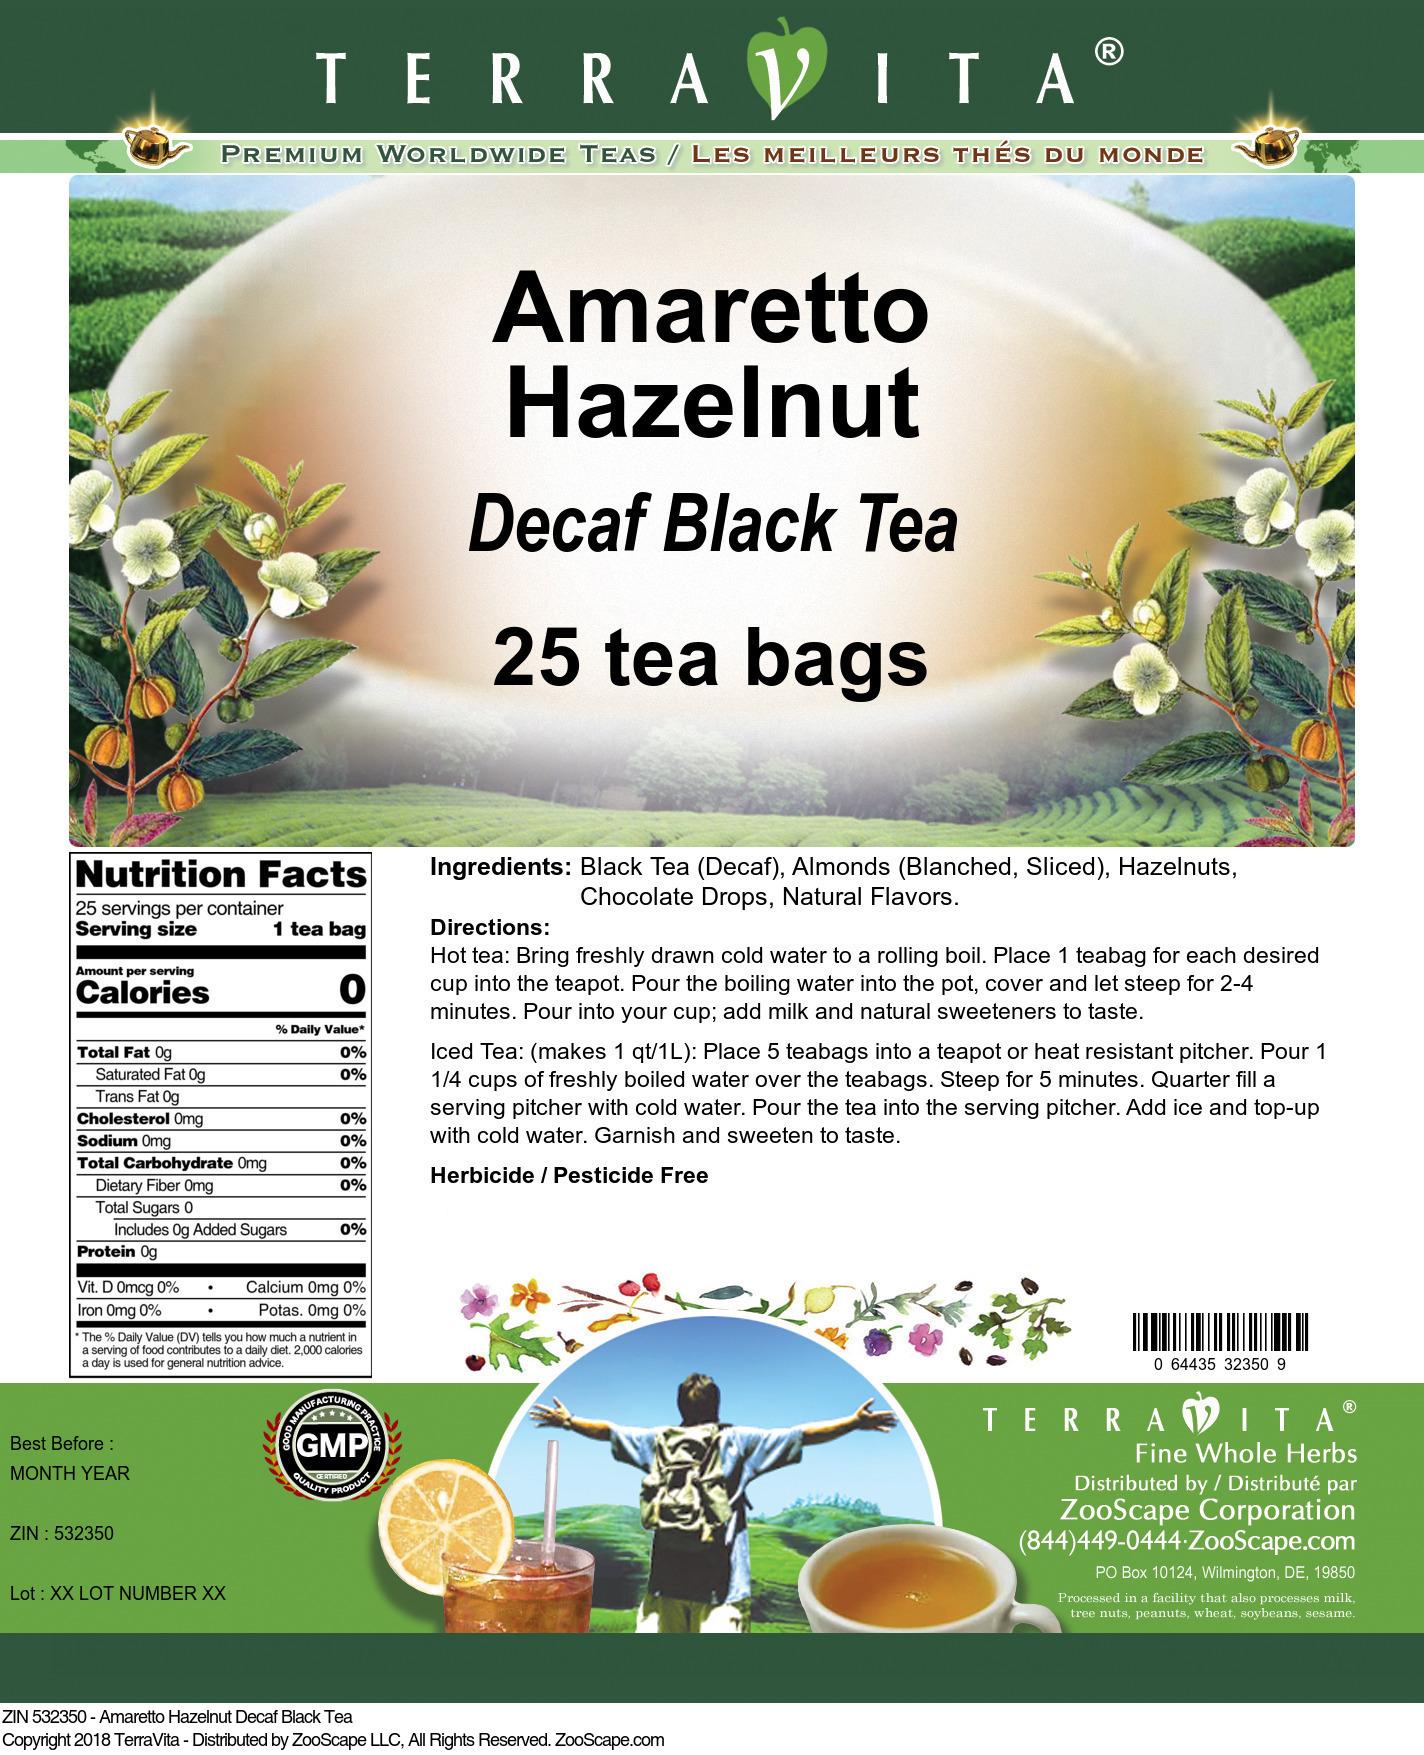 Amaretto Hazelnut Decaf Black Tea